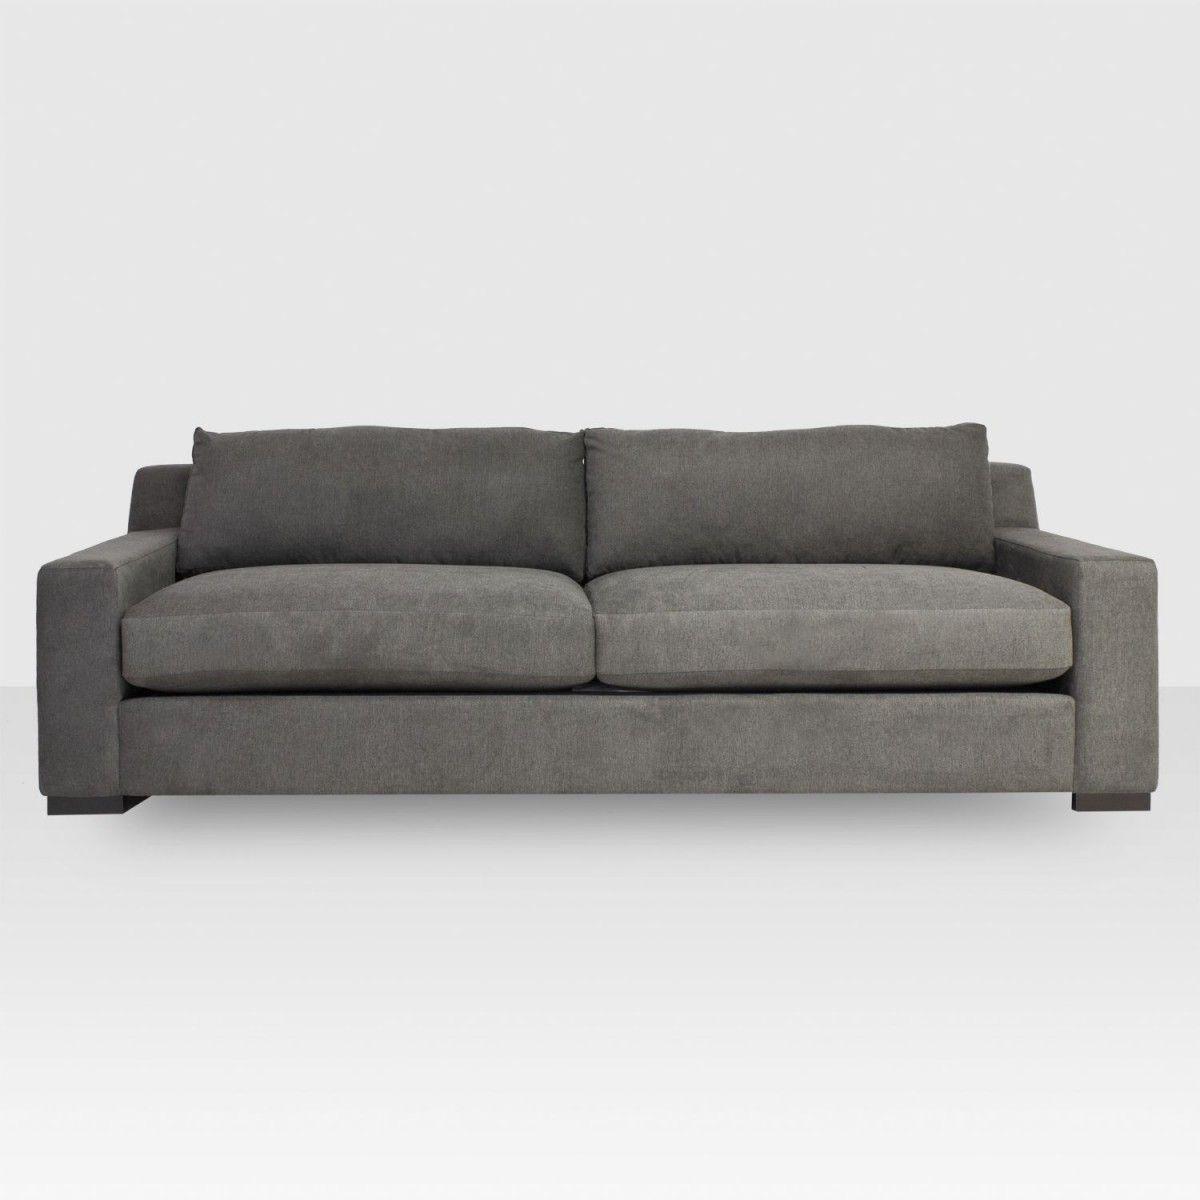 Jordan Xl Sofa Elte Market Sofa Furniture Clearance Furniture Sale